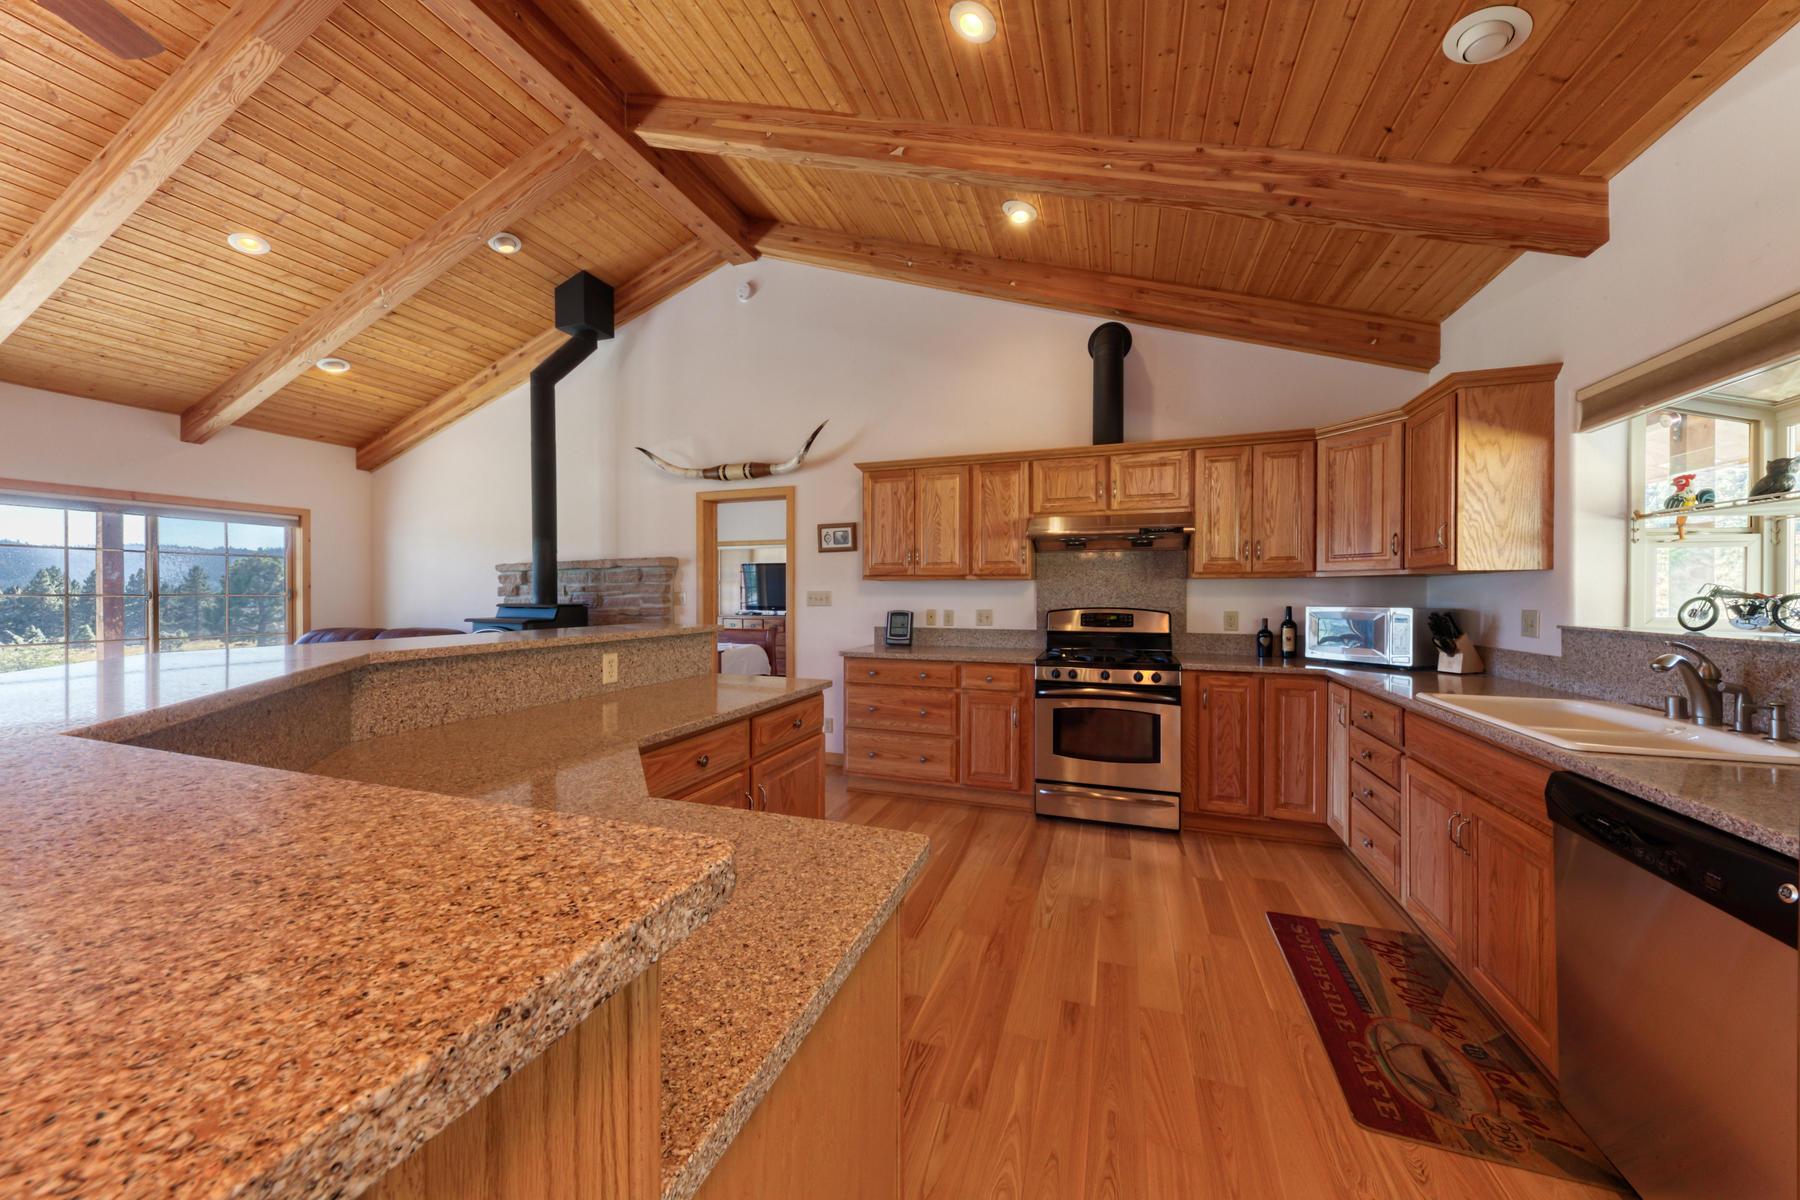 Additional photo for property listing at 79905 Panoramic Road, Portola, CA 96122 79905 Panoramic Road 贝克沃思, 加利福尼亚州 96122 美国